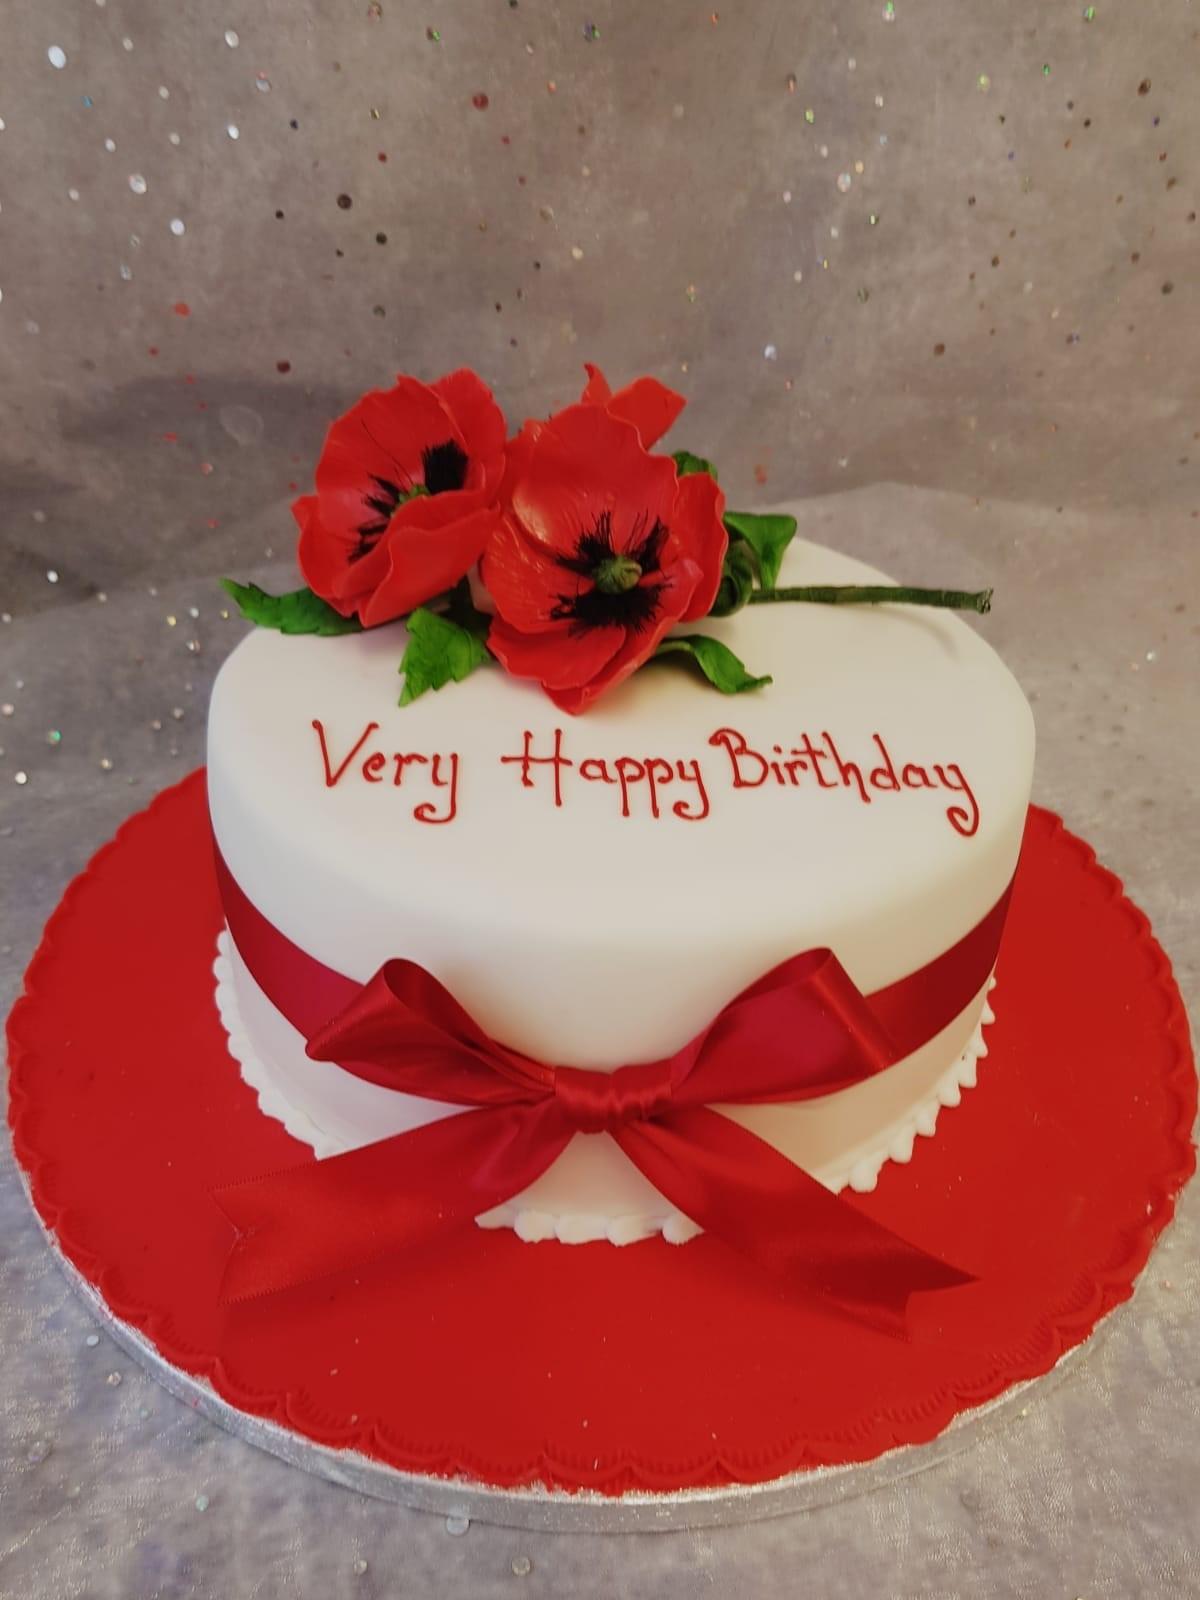 Birthday Cakes Archives Ravens Bakery Of Essex Ltd